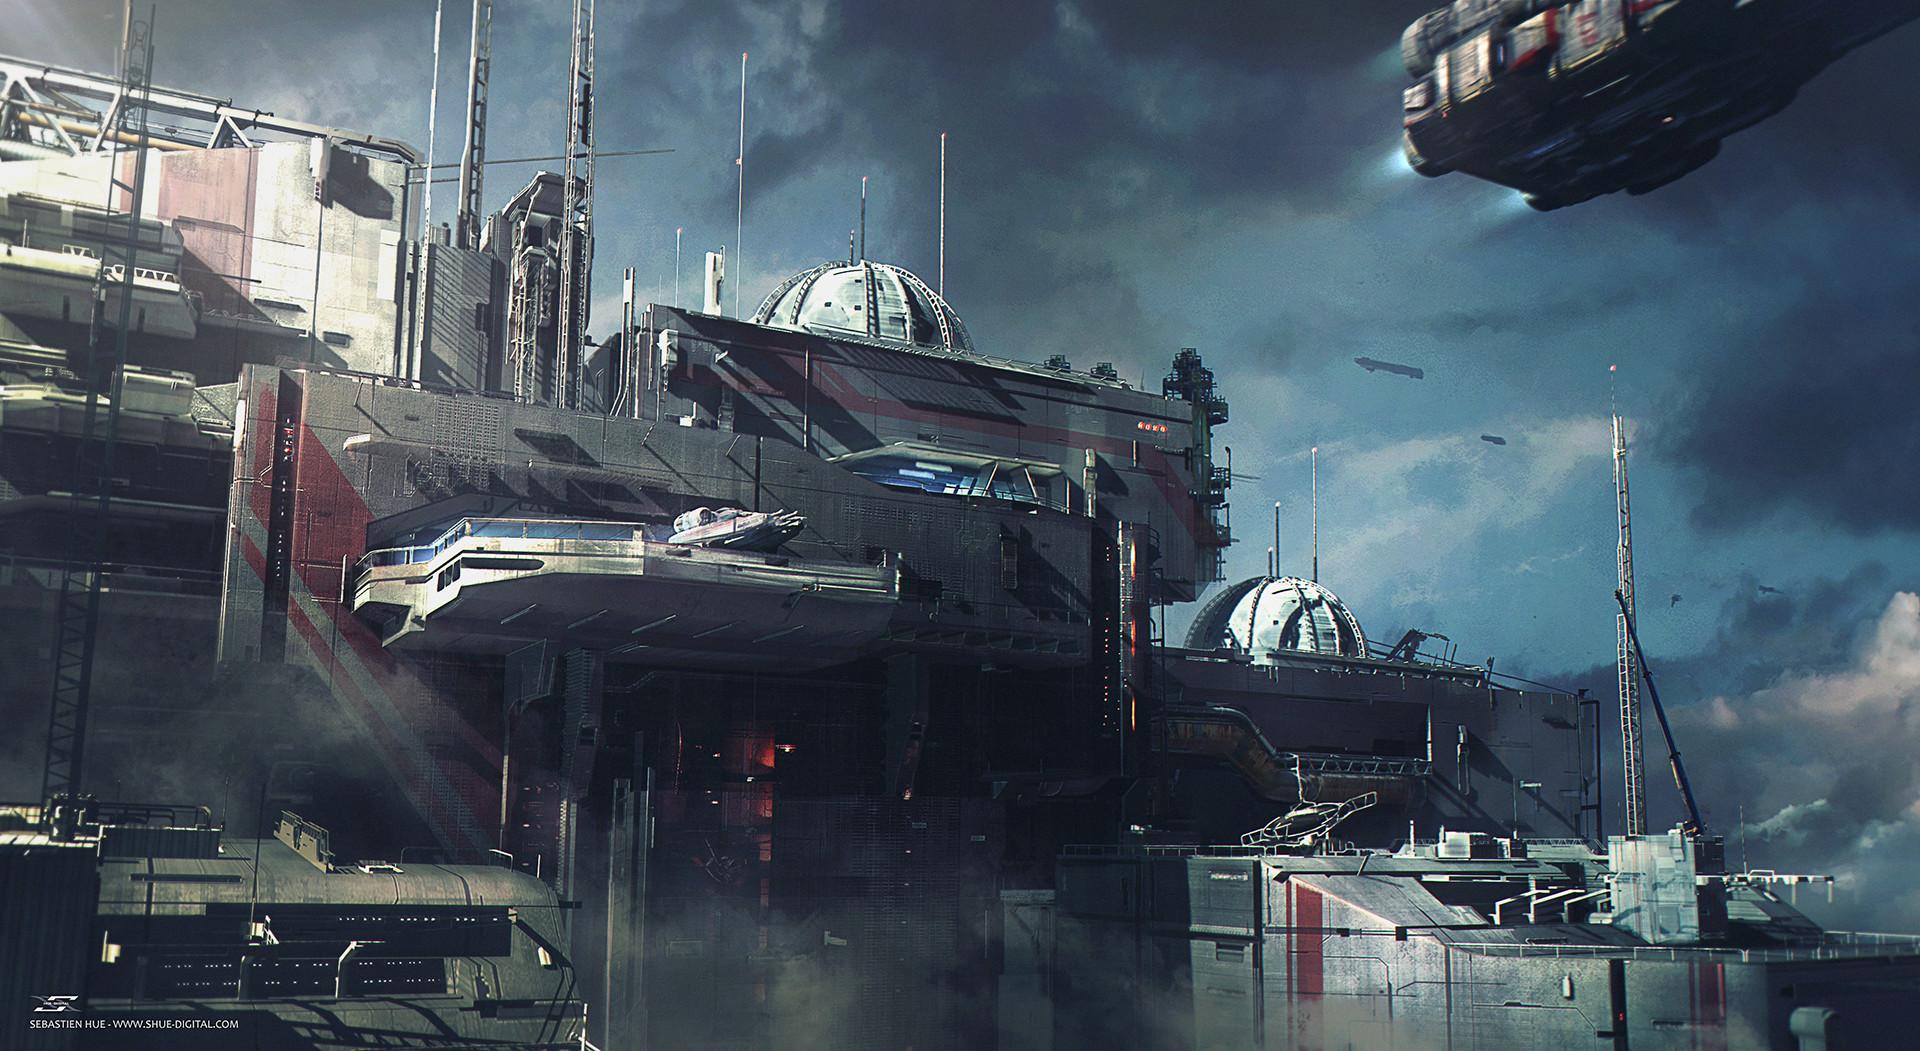 Amazing New Sci-Fi Artworks by Sebastien Hue